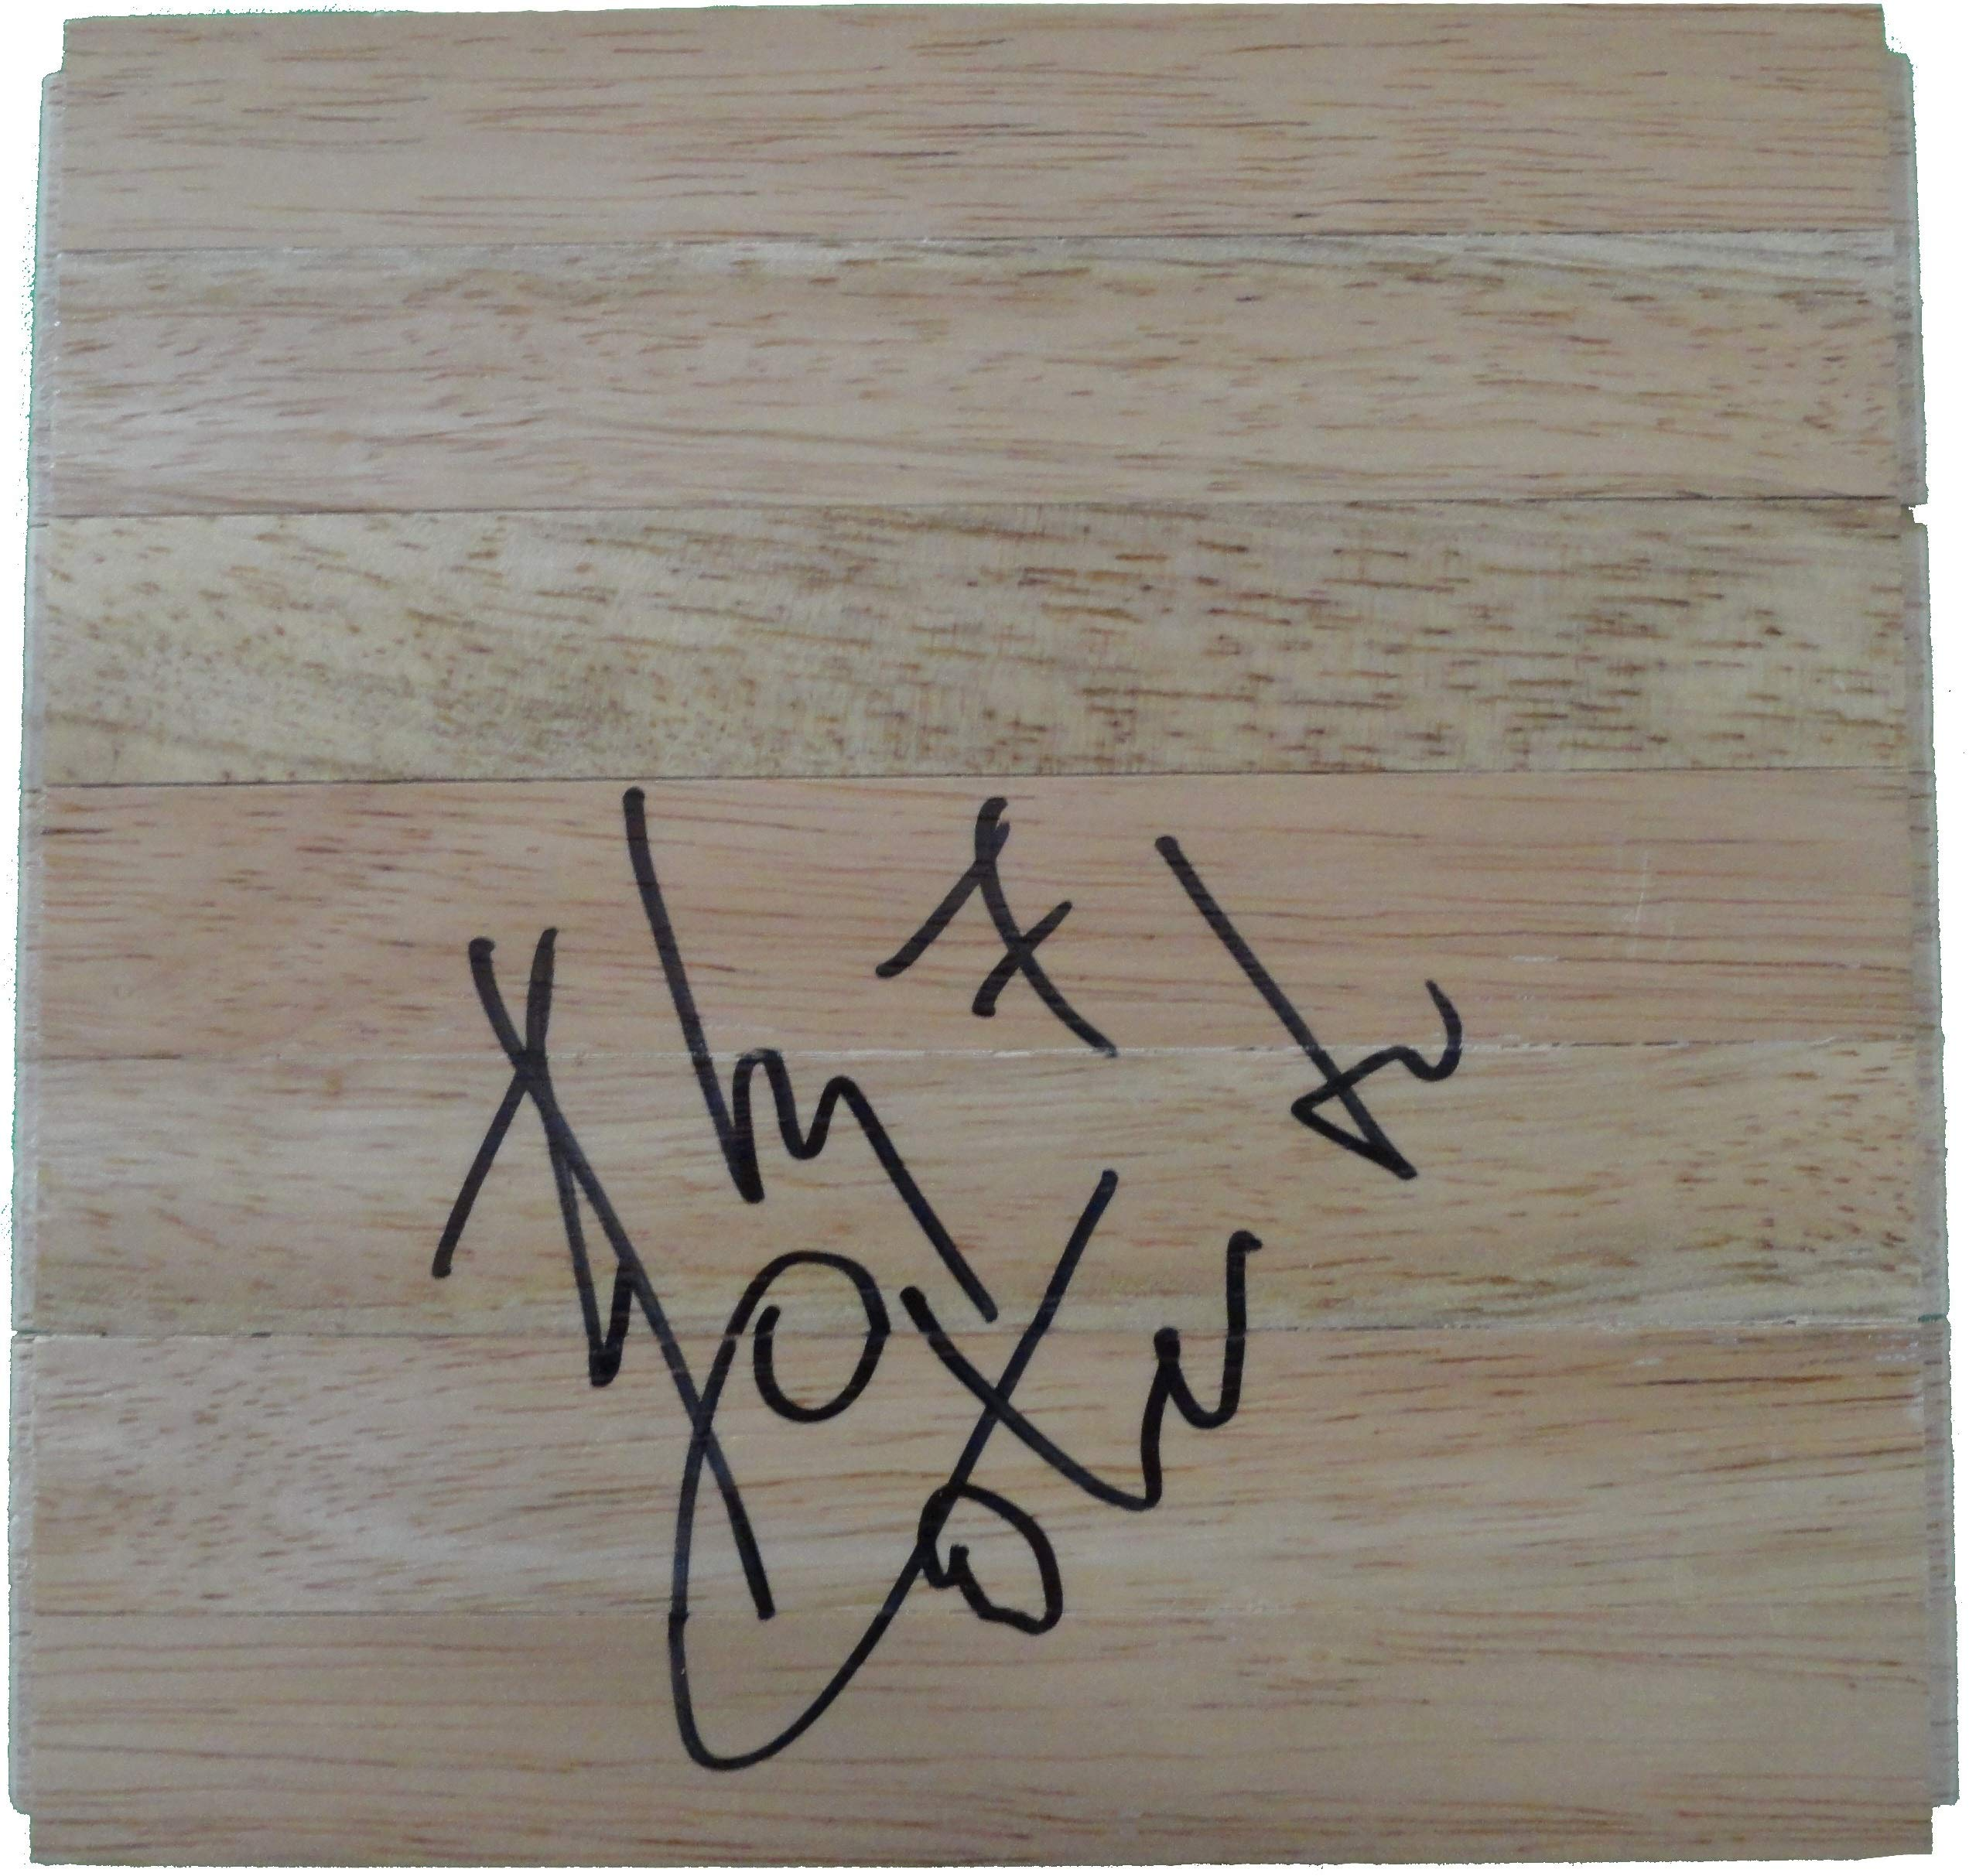 San Antonio Spurs Fabricio Oberto Autographed Hand Signed 6x6 Parquet Floorboard with Proof Photo of Signing, Washington Wizards, COA Basketball Floor Boards